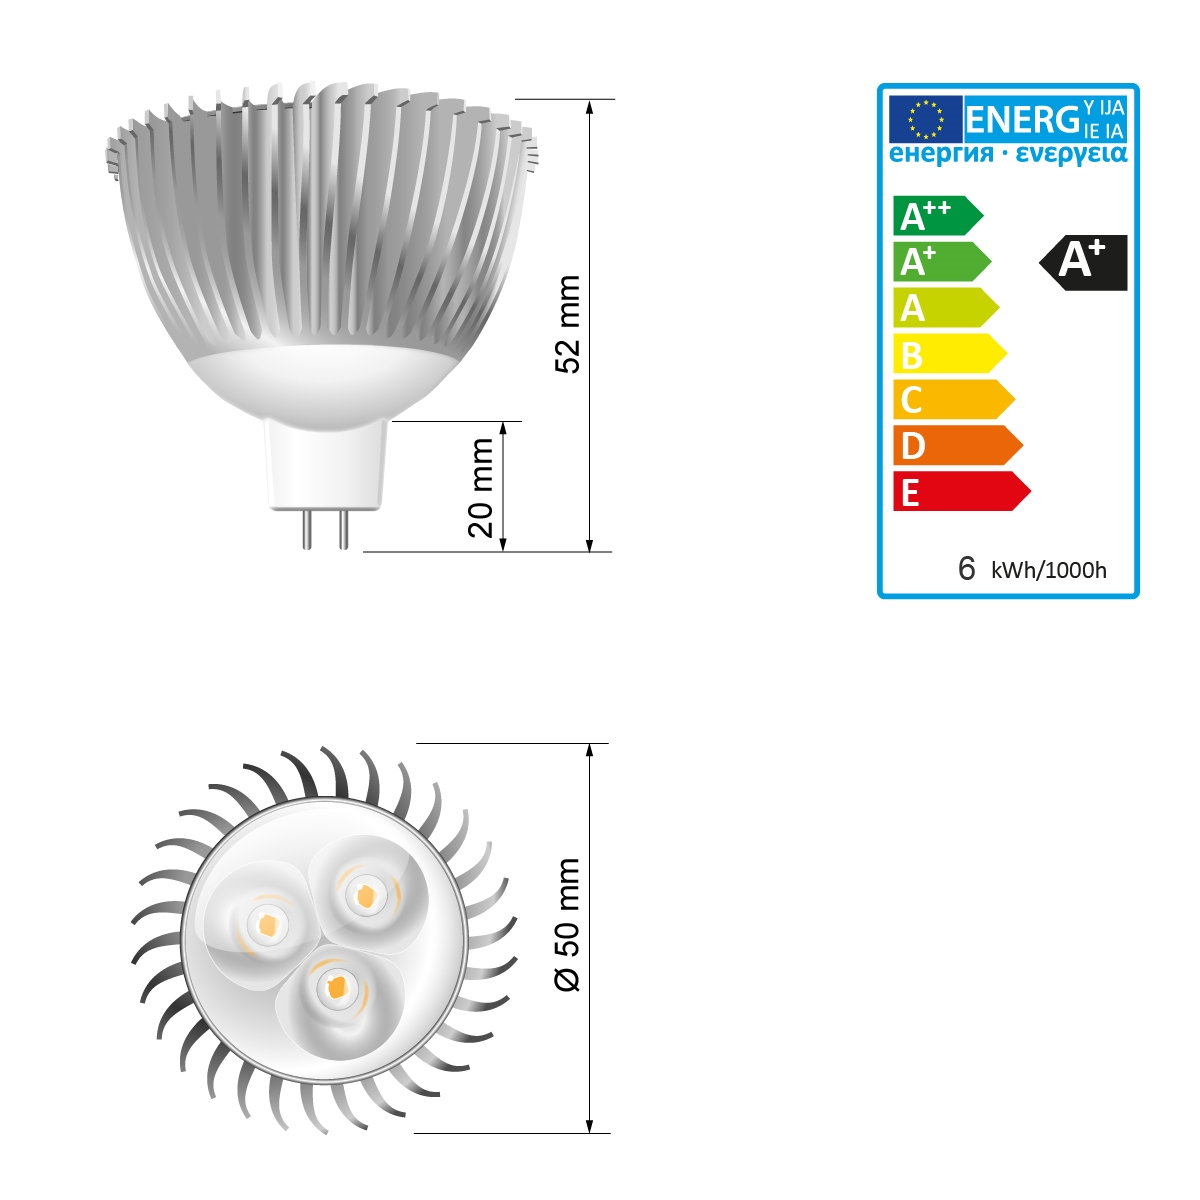 10x led gu10 mr16 smd recessed ceiling spotlights downlights bulbs spot lights ebay. Black Bedroom Furniture Sets. Home Design Ideas